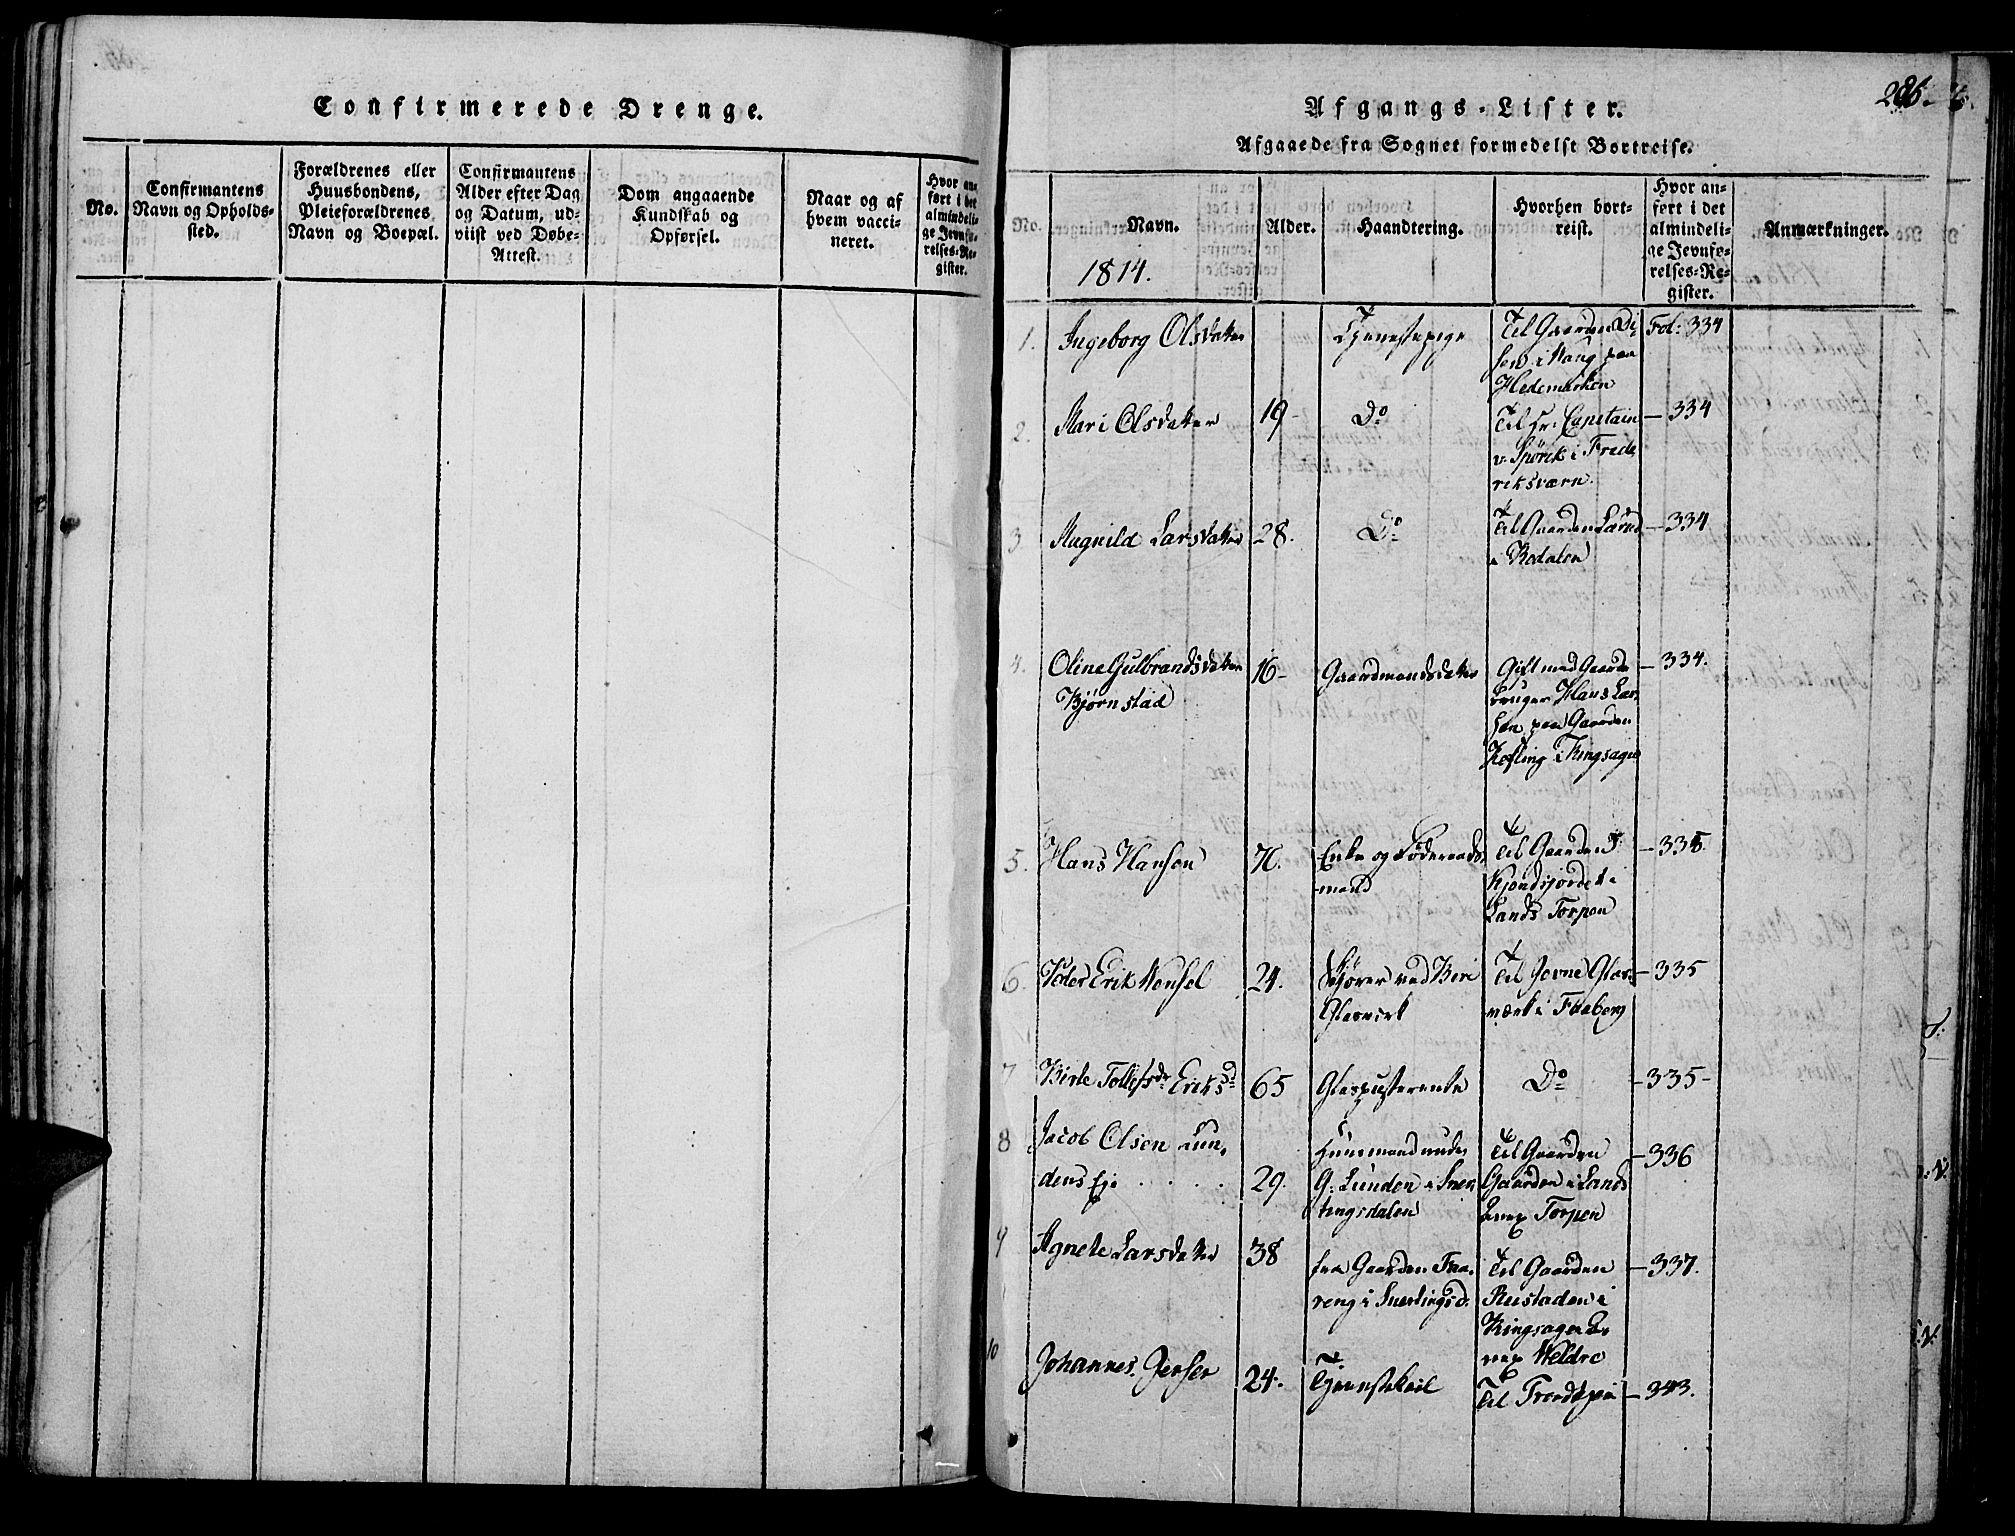 SAH, Biri prestekontor, Ministerialbok nr. 3, 1814-1828, s. 286